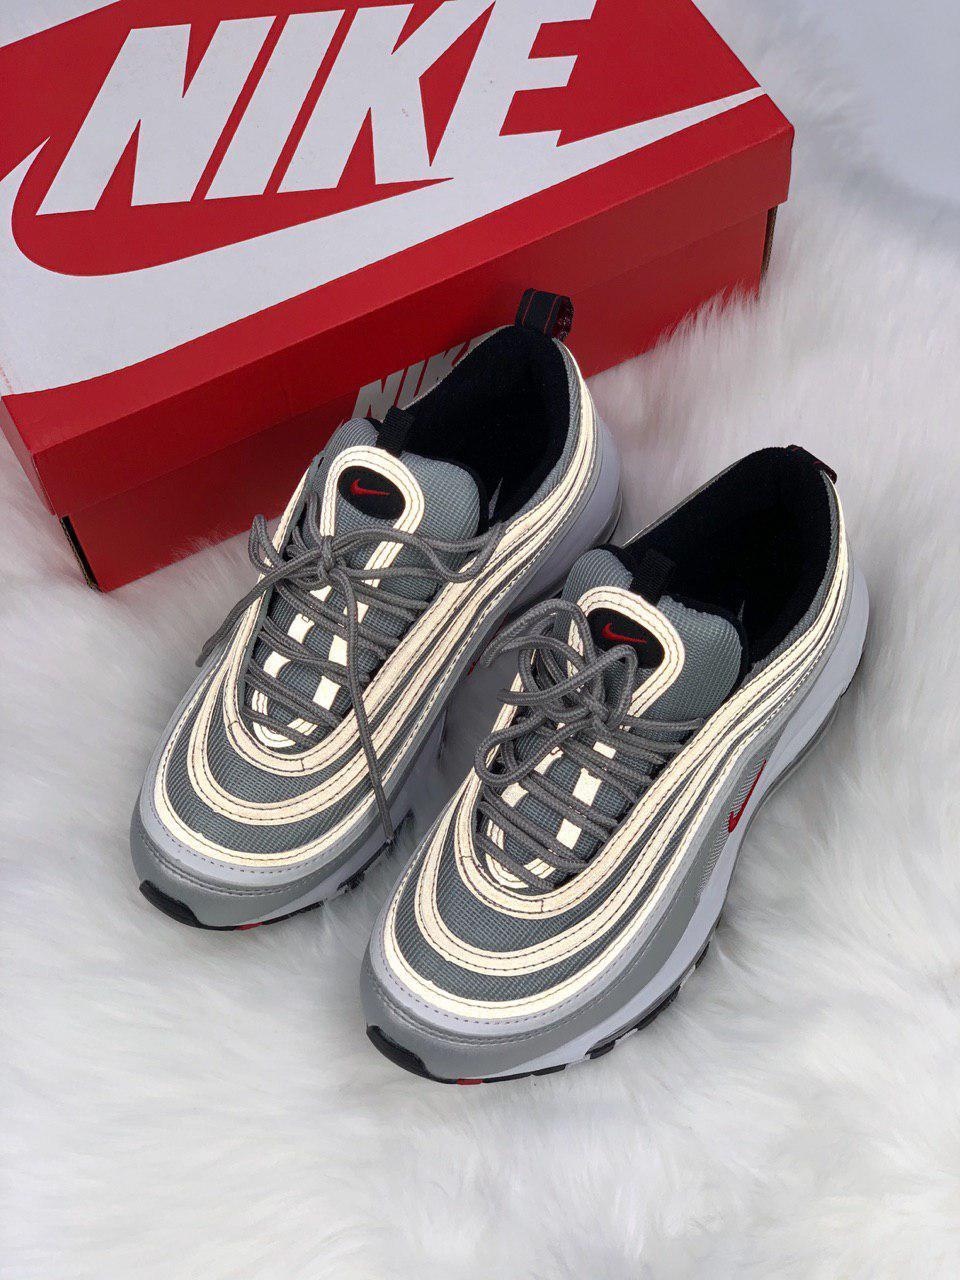 e4dc7417 Кроссовки Nike Air Max 97 Silver Bullet - Интернет магазин обуви «im-РоLLi»